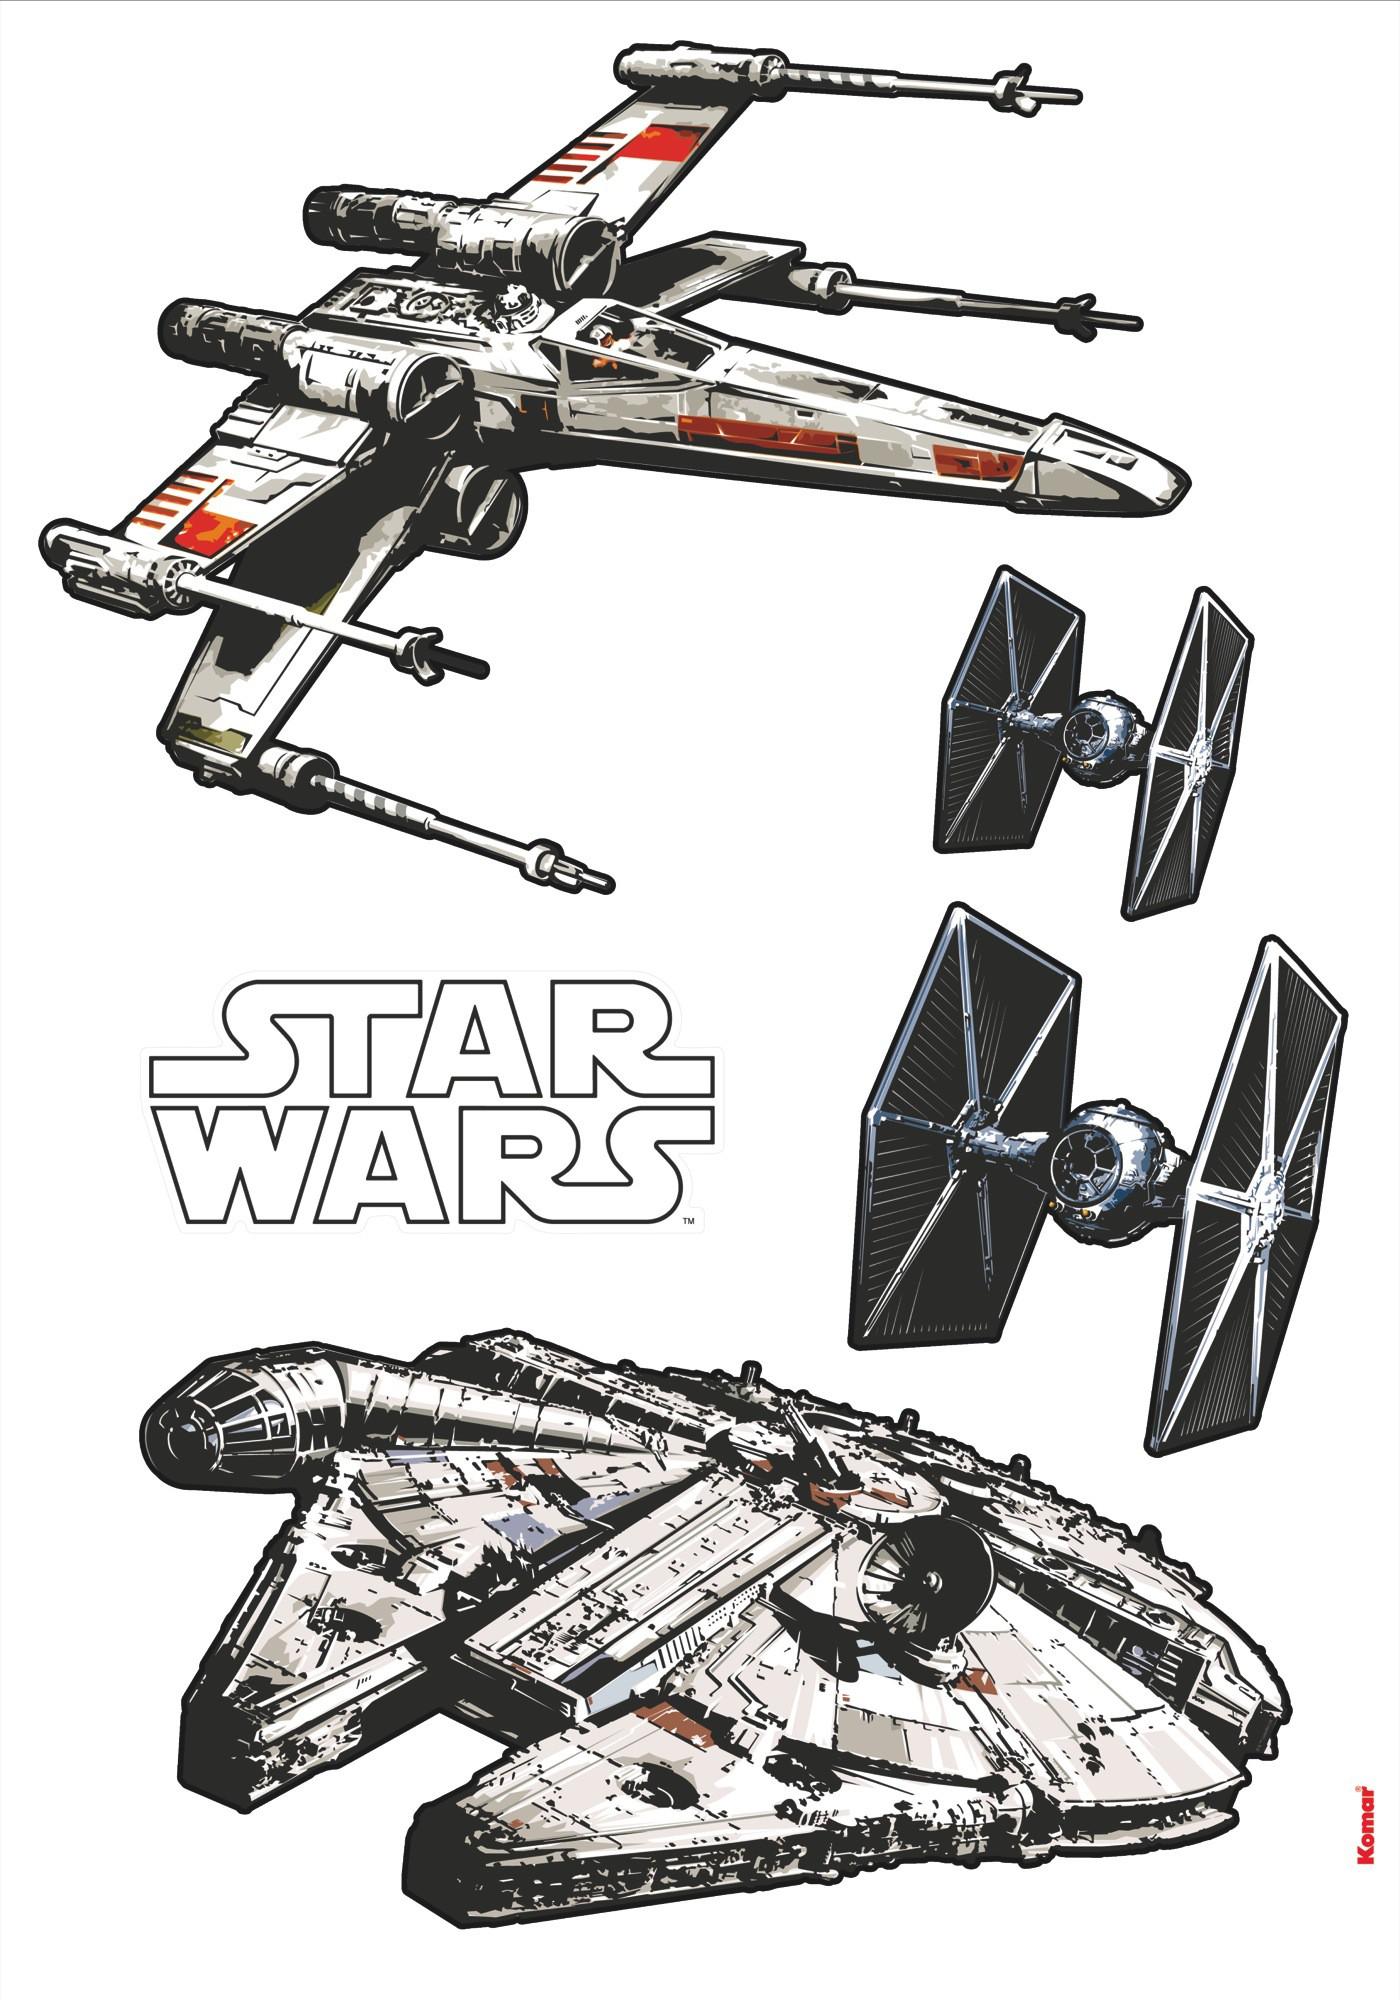 Star Wars Millenium Falcon falmatrica